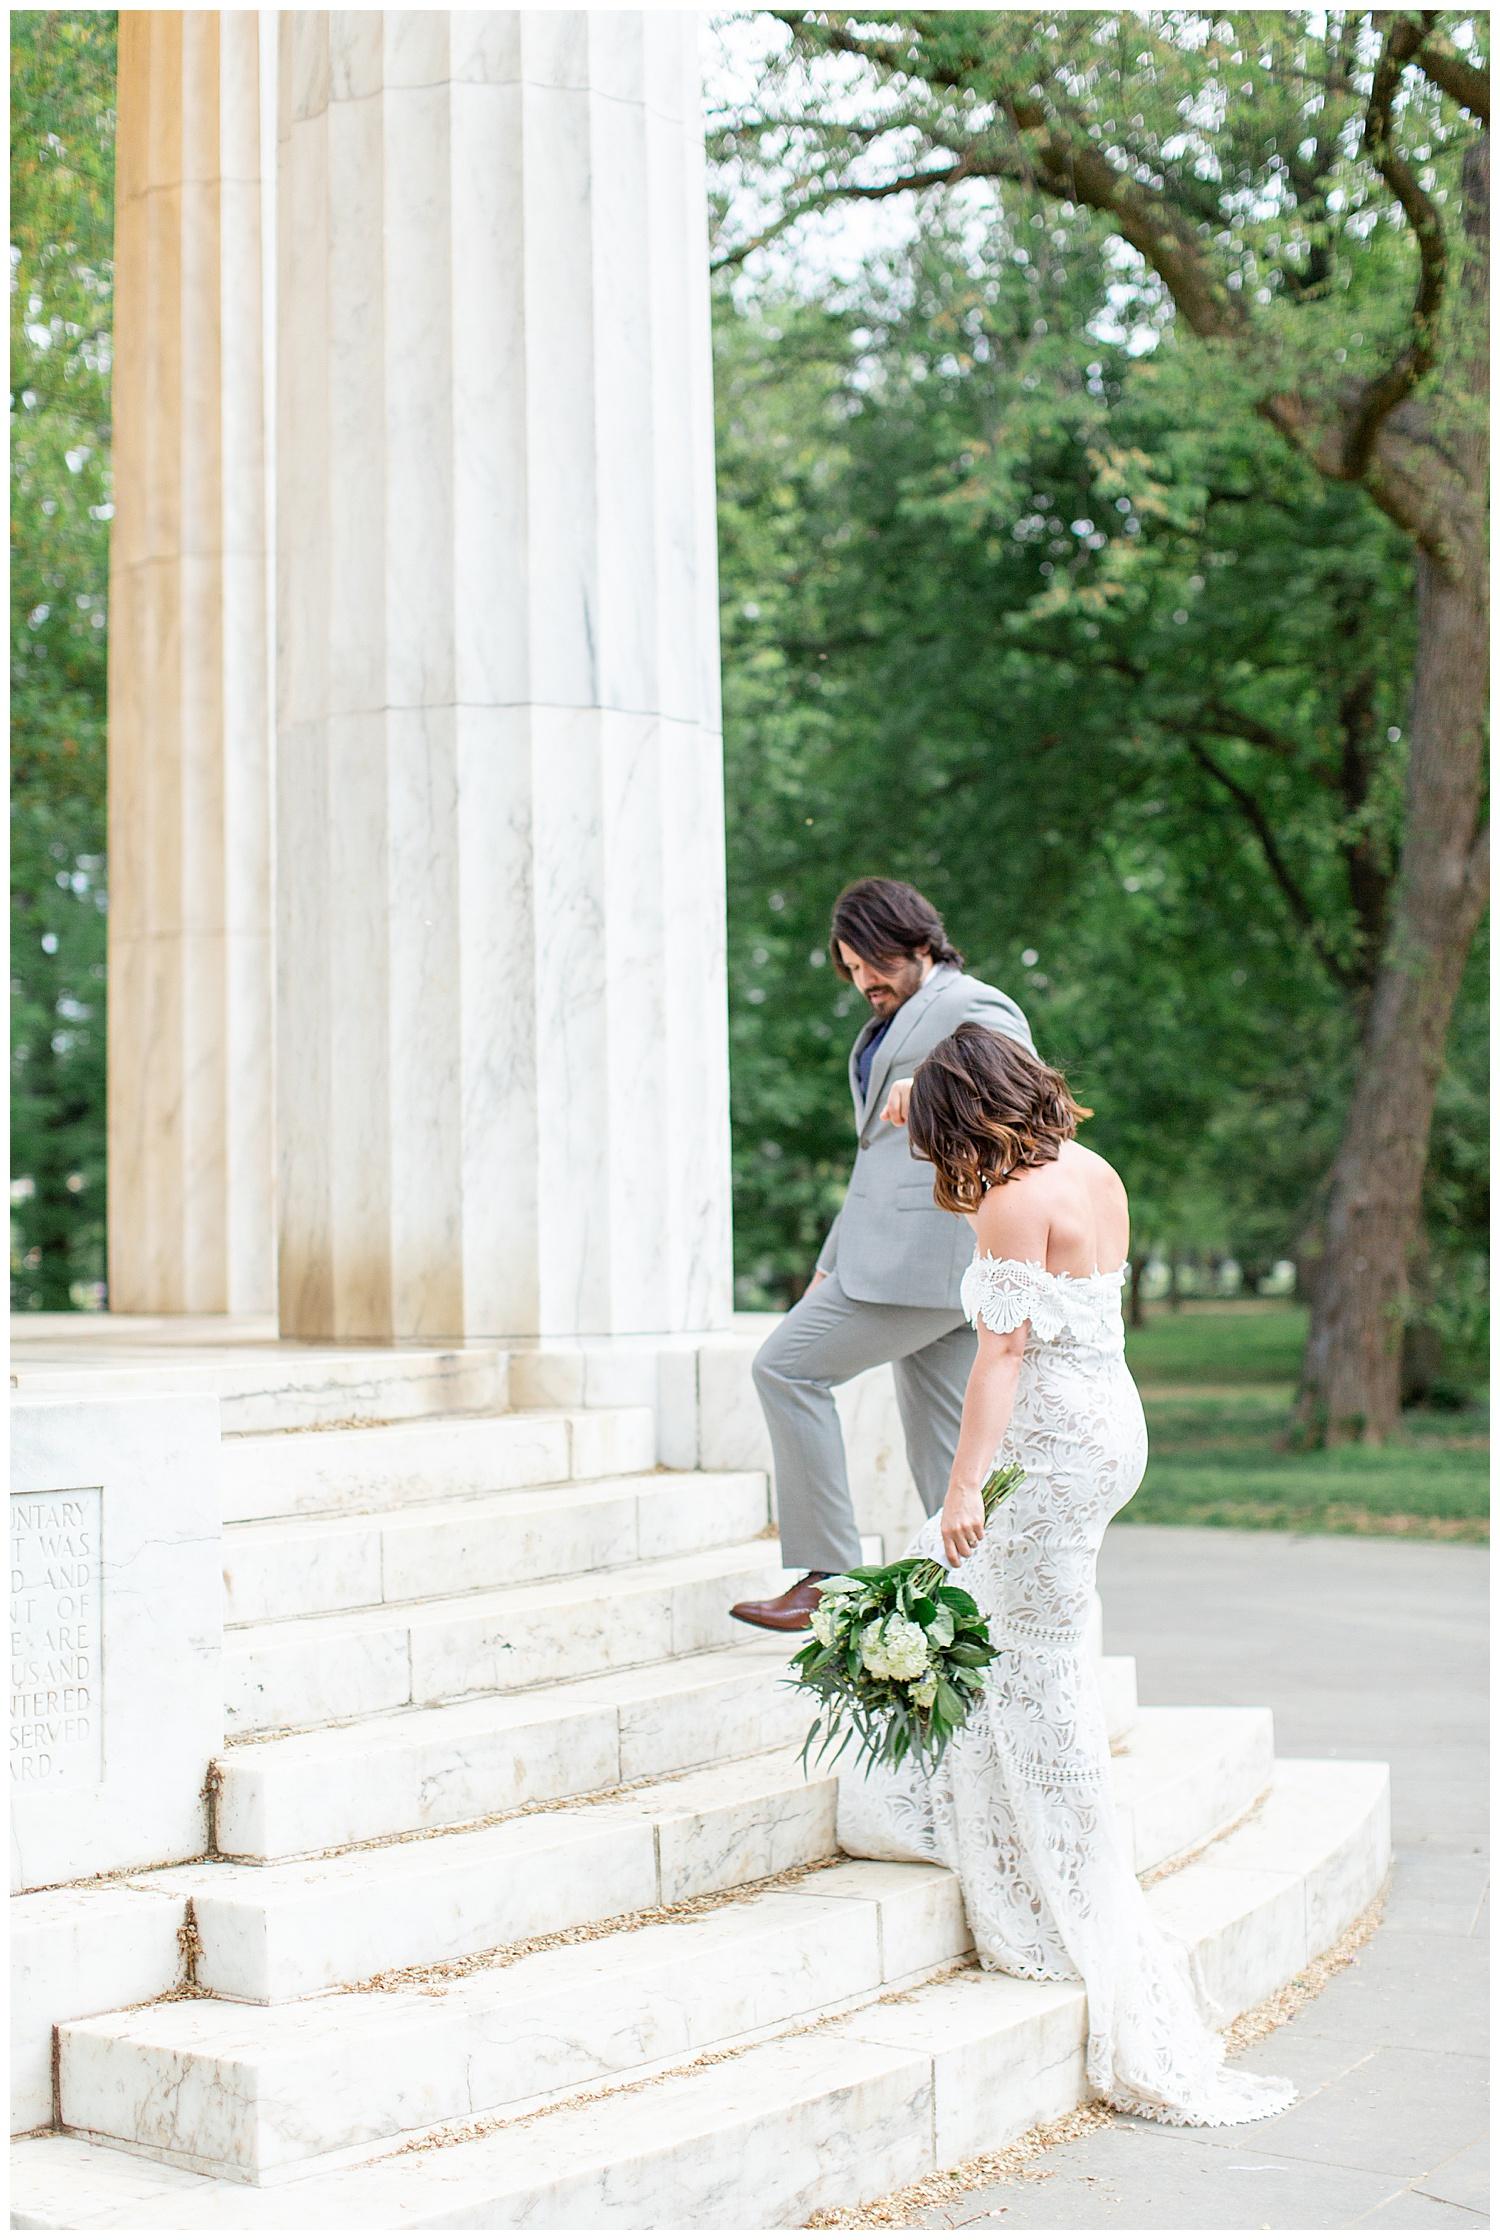 emily-belson-photography-washington-dc-wedding-34.jpg